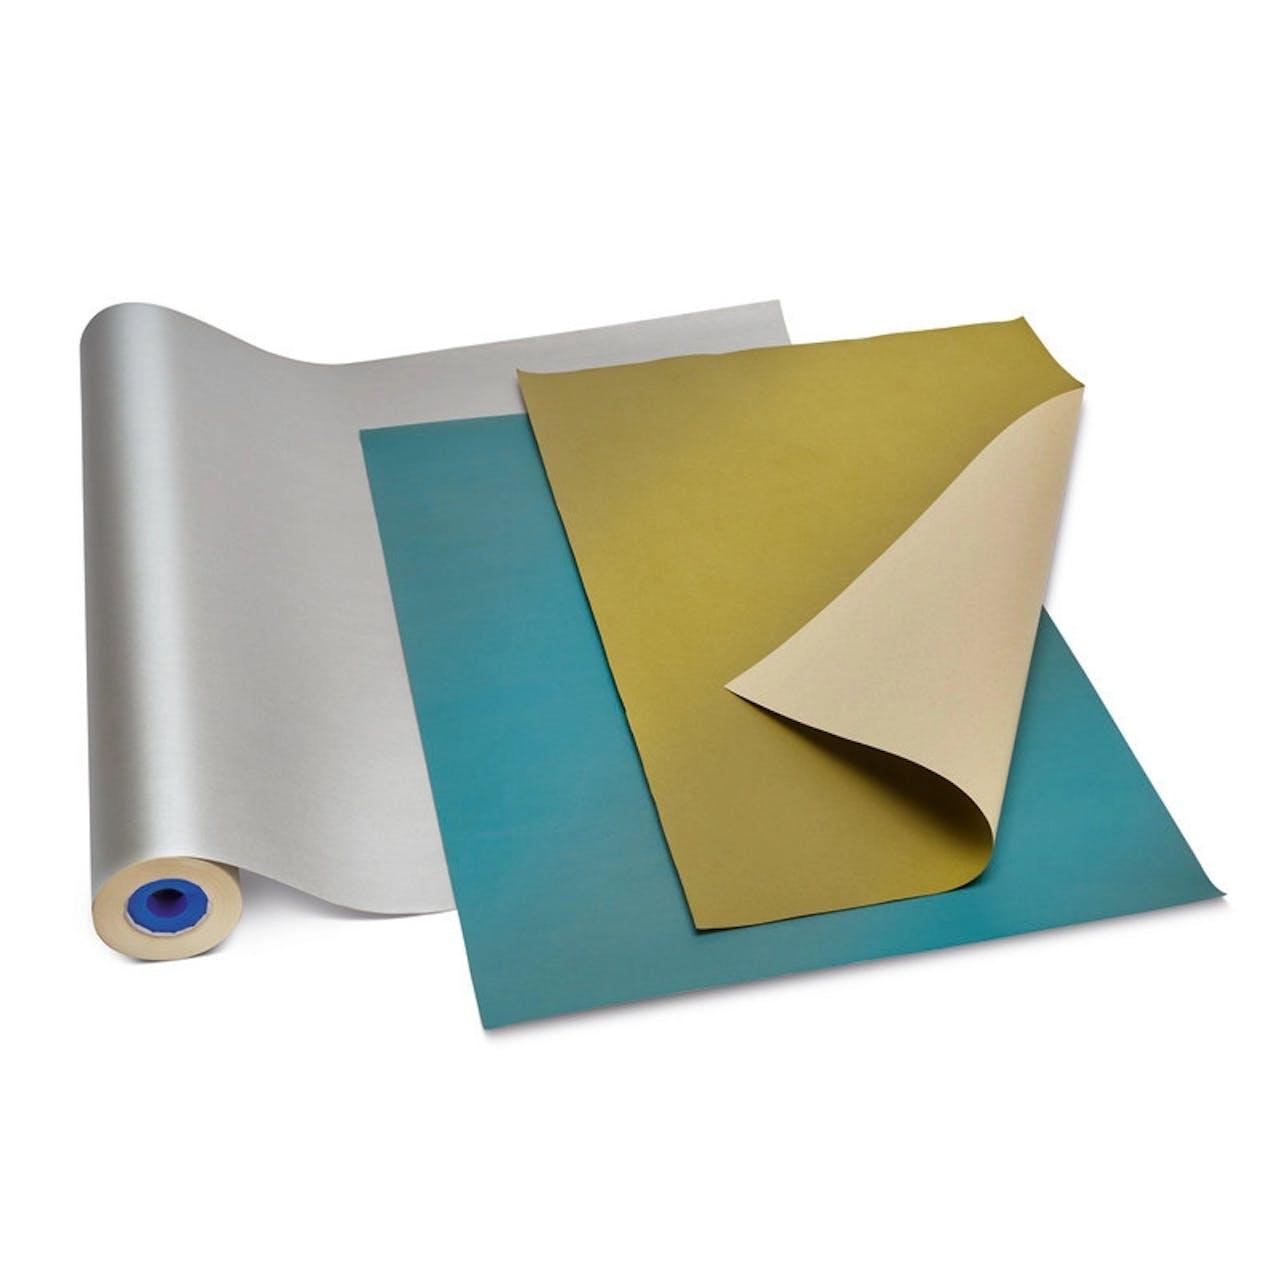 Recycling-Geschenkpapier-Rolle, VAR: gpr2